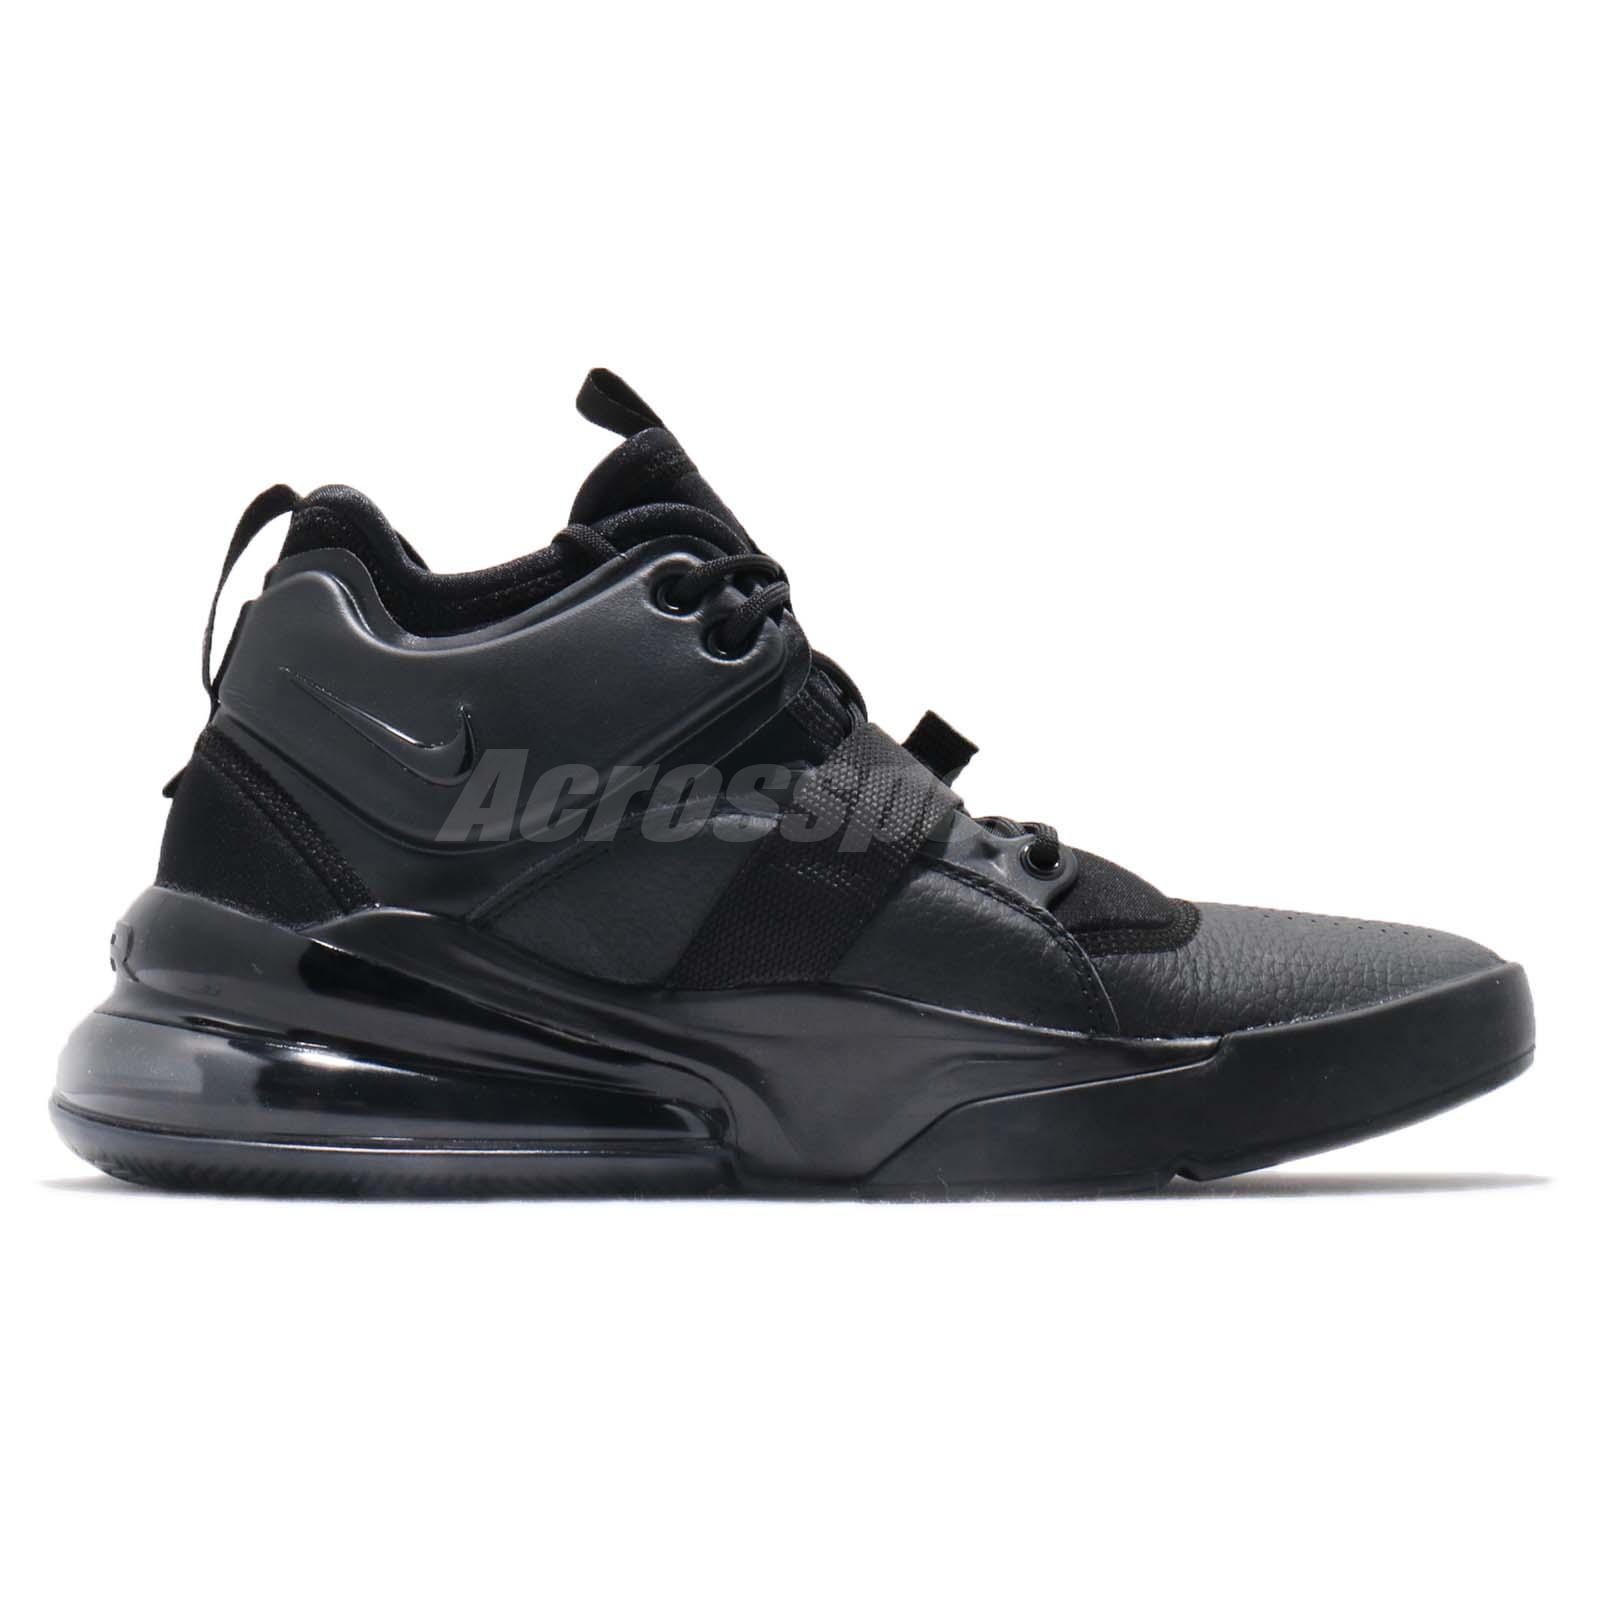 e5fd96a5ecfacd Nike Air Force 270 Triple Black Men Lifestyle Casual Shoes Sneakers ...